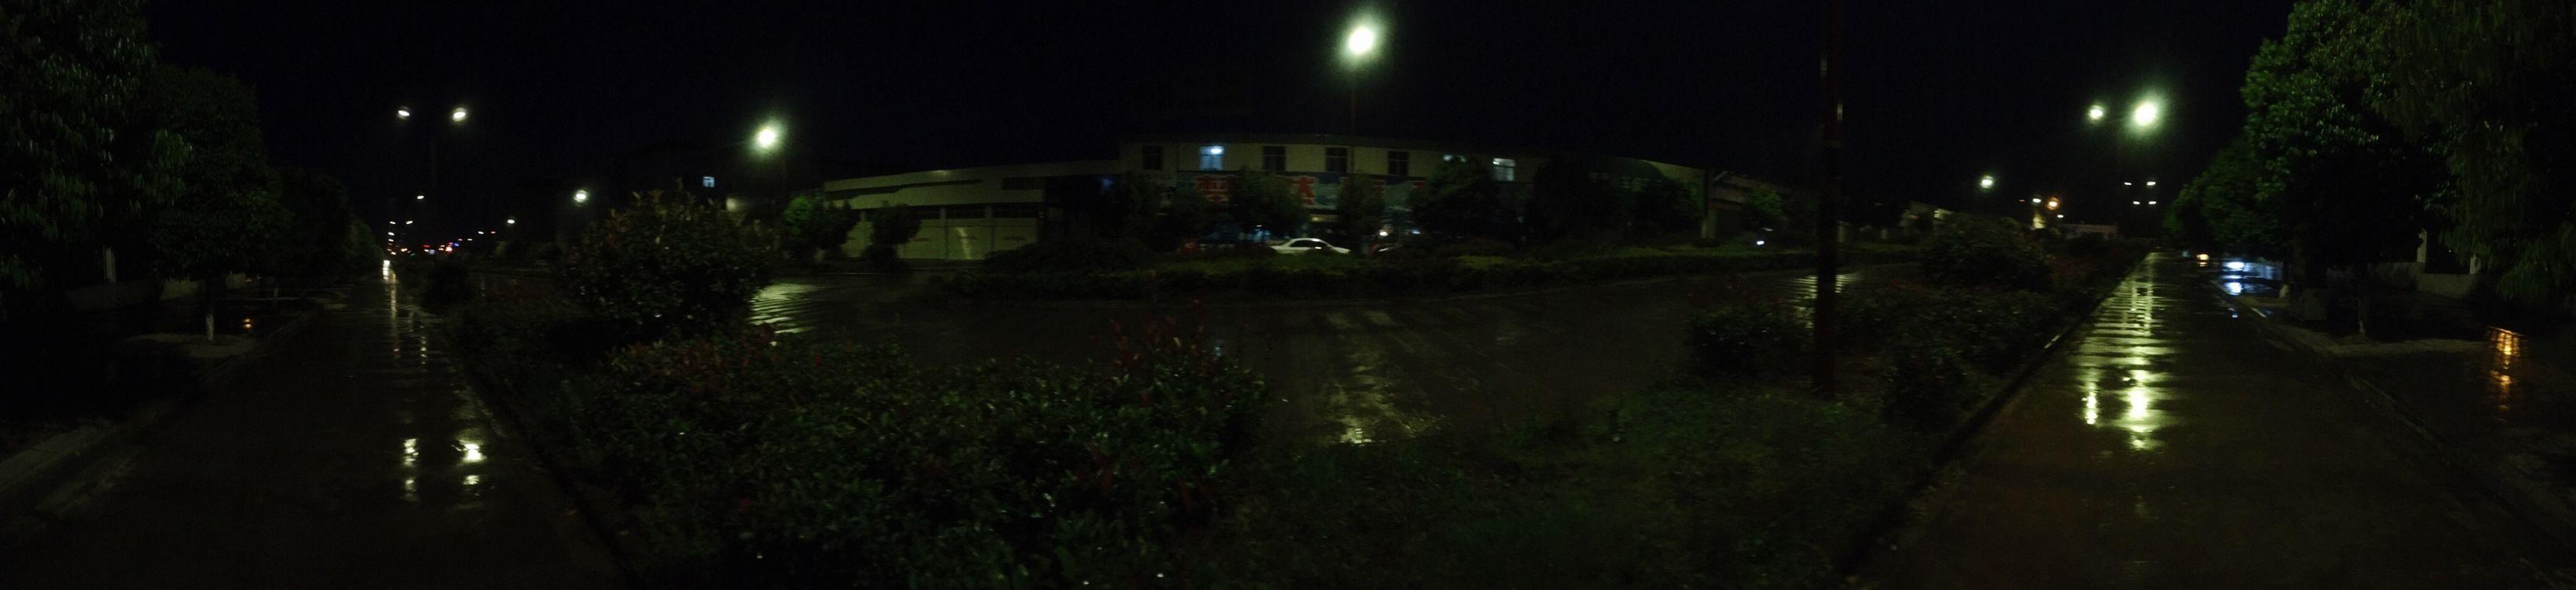 On a raining evening .